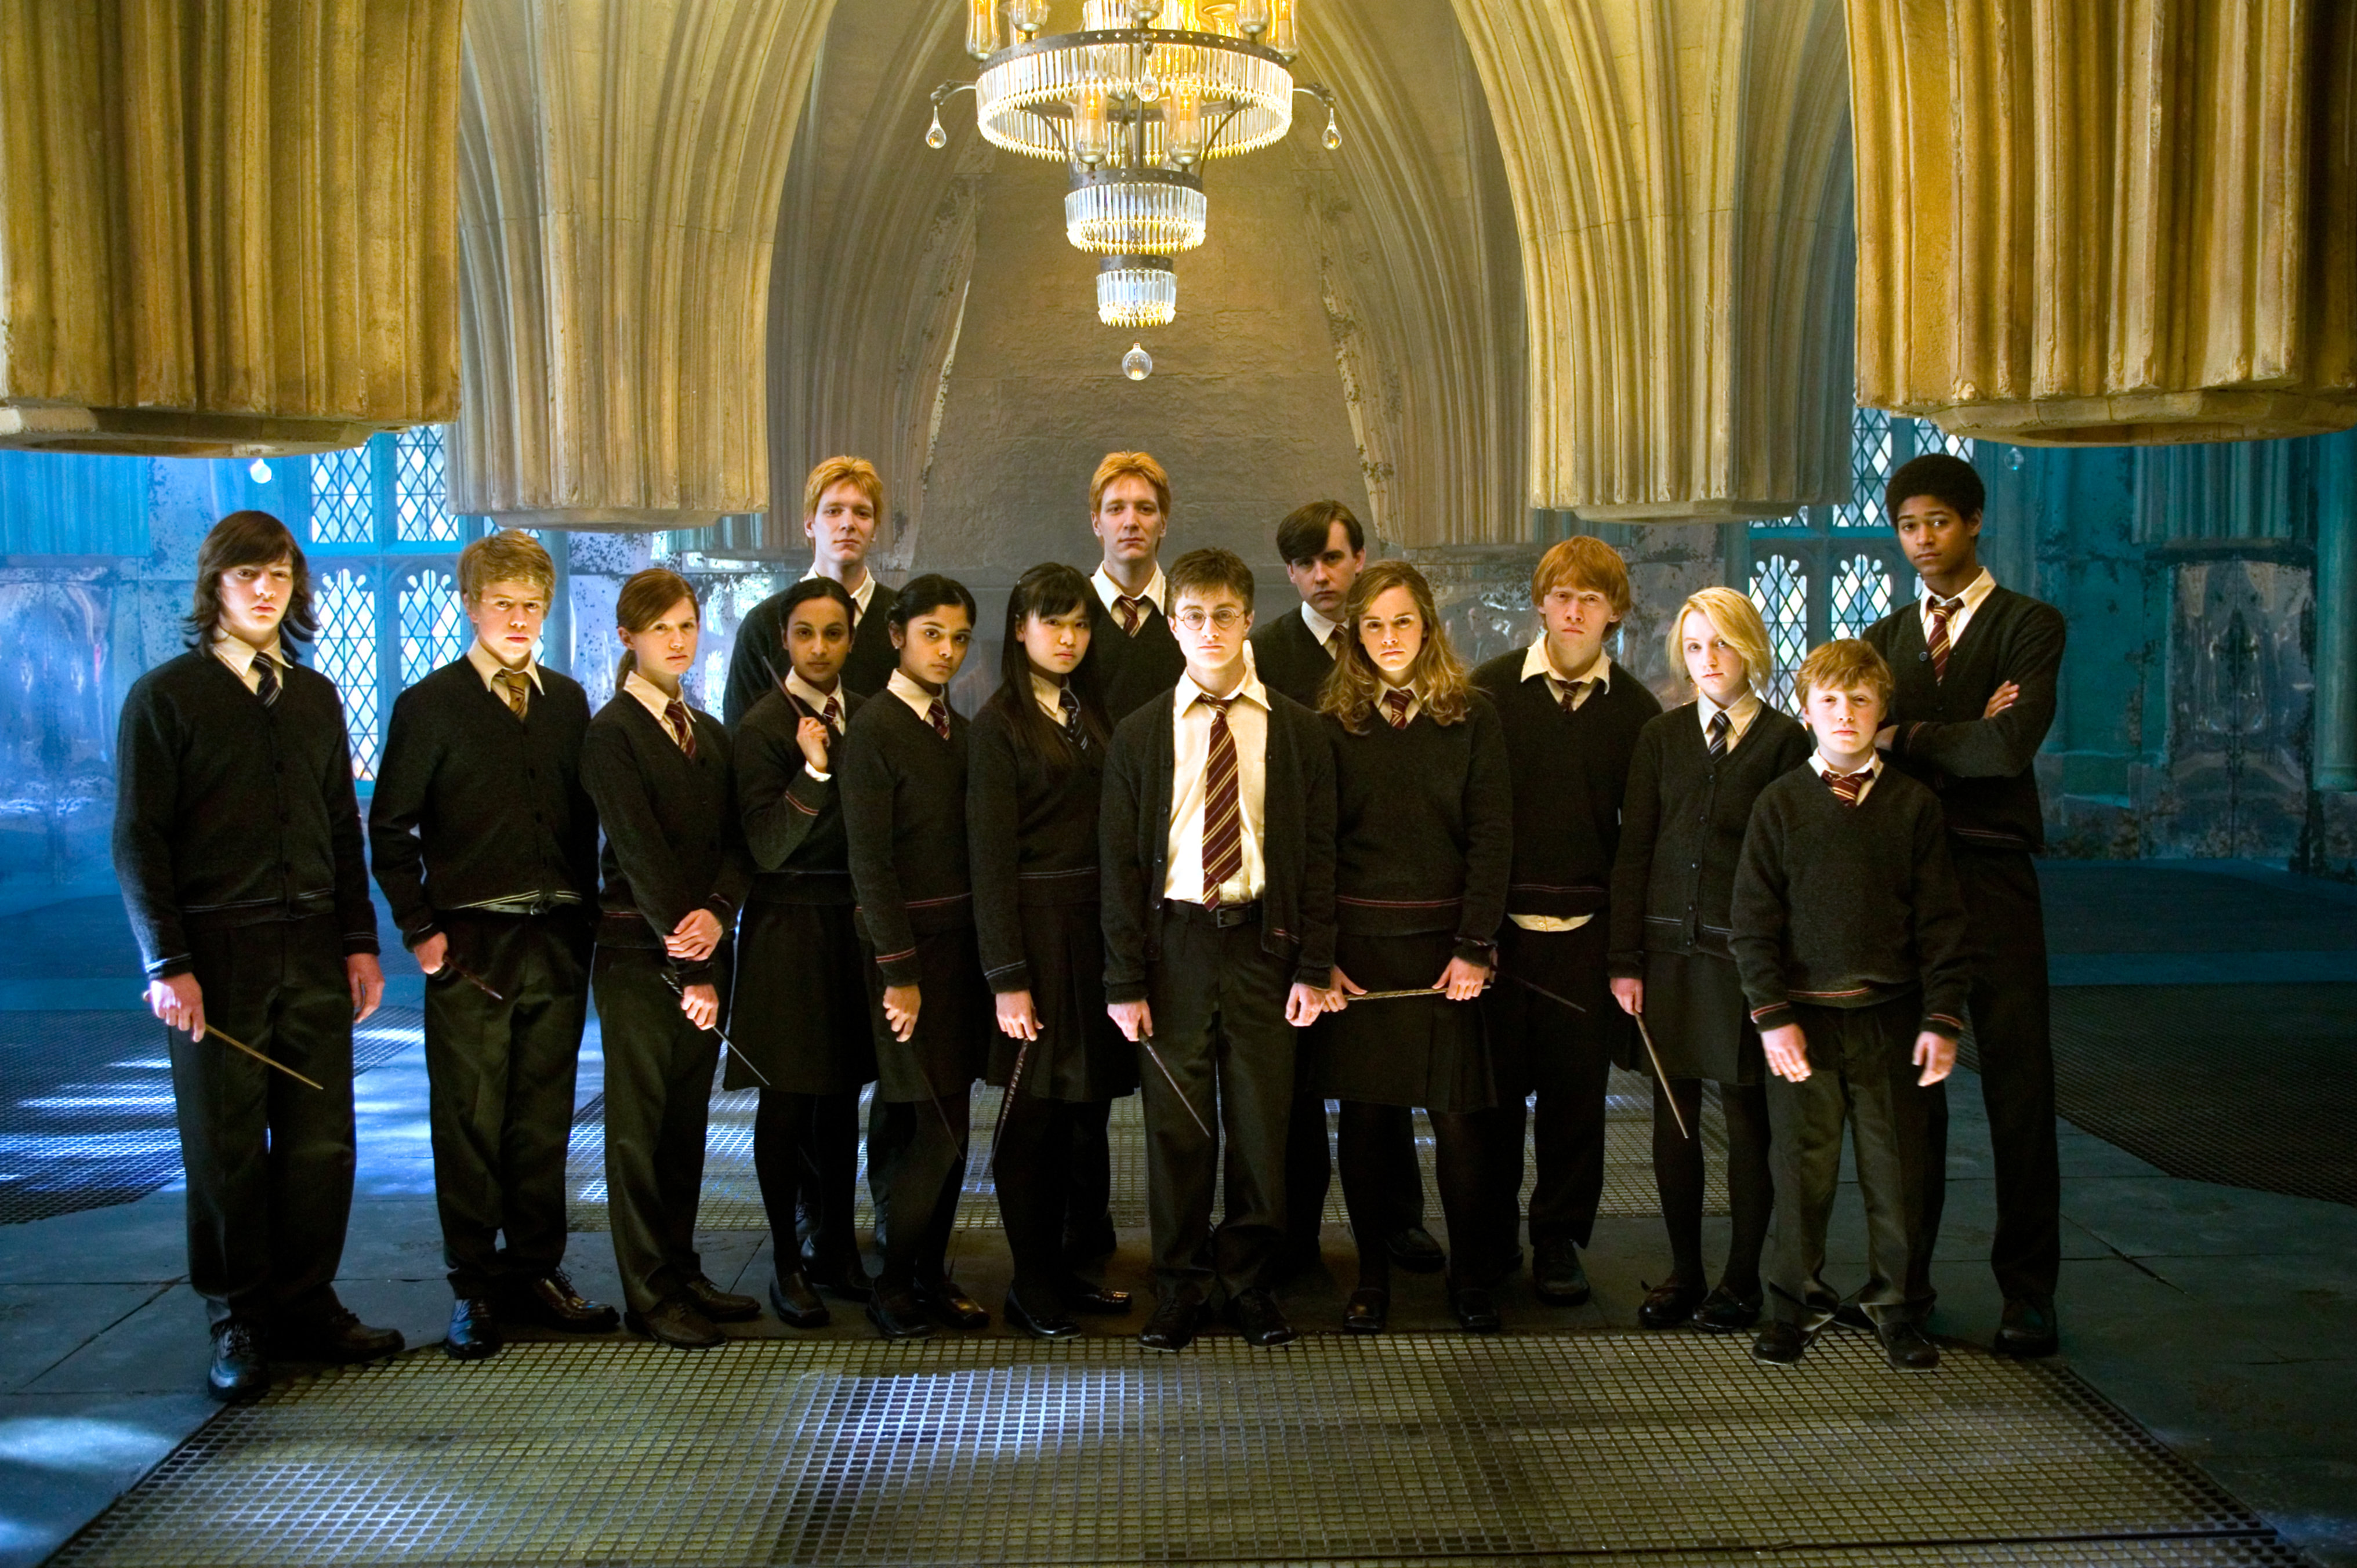 Tiedosto:Dumbledore's Army.jpg